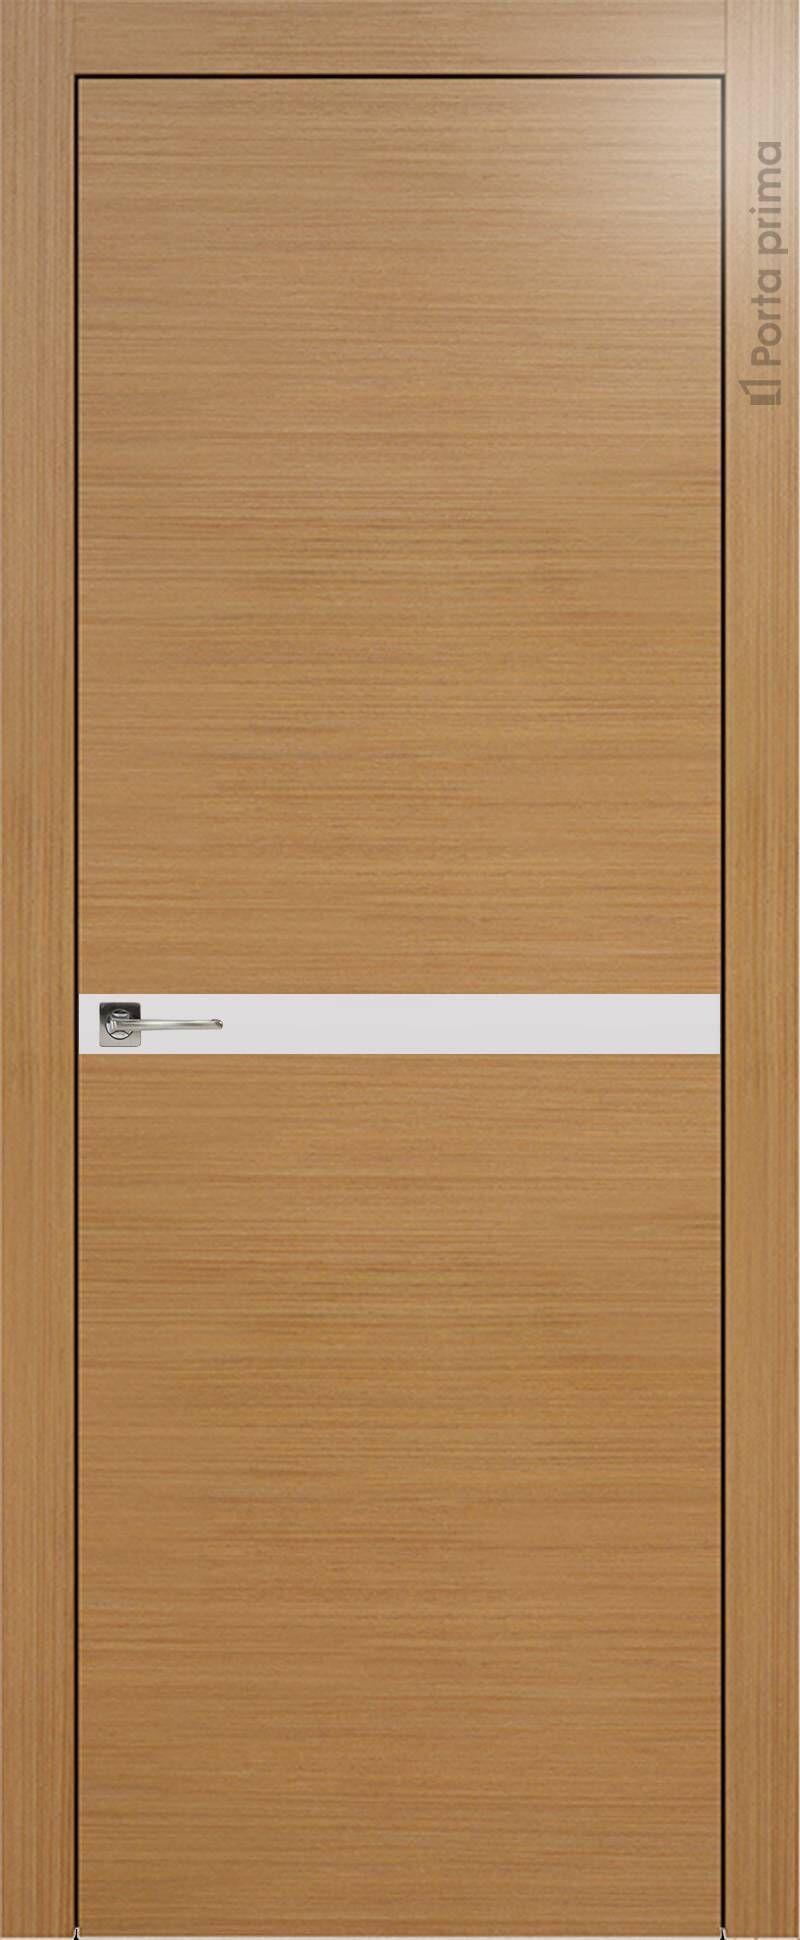 Tivoli Б-4 цвет - Миланский орех Без стекла (ДГ)